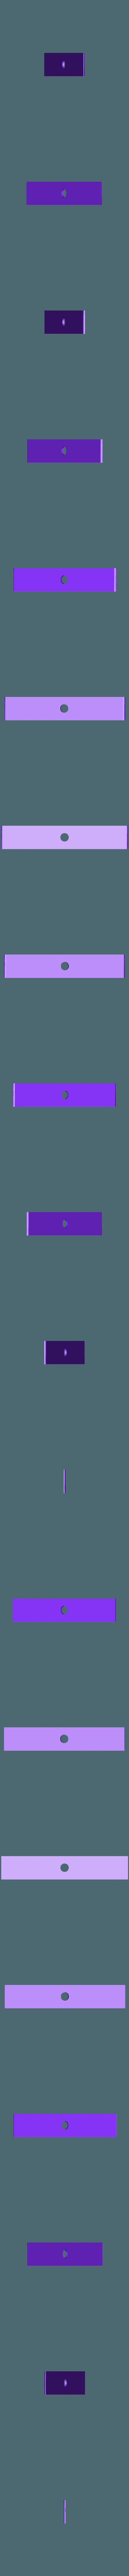 Lid.stl Download free SCAD file Perpetual Flip Calendar (W/ Customizable Font) • 3D printable model, Dsk